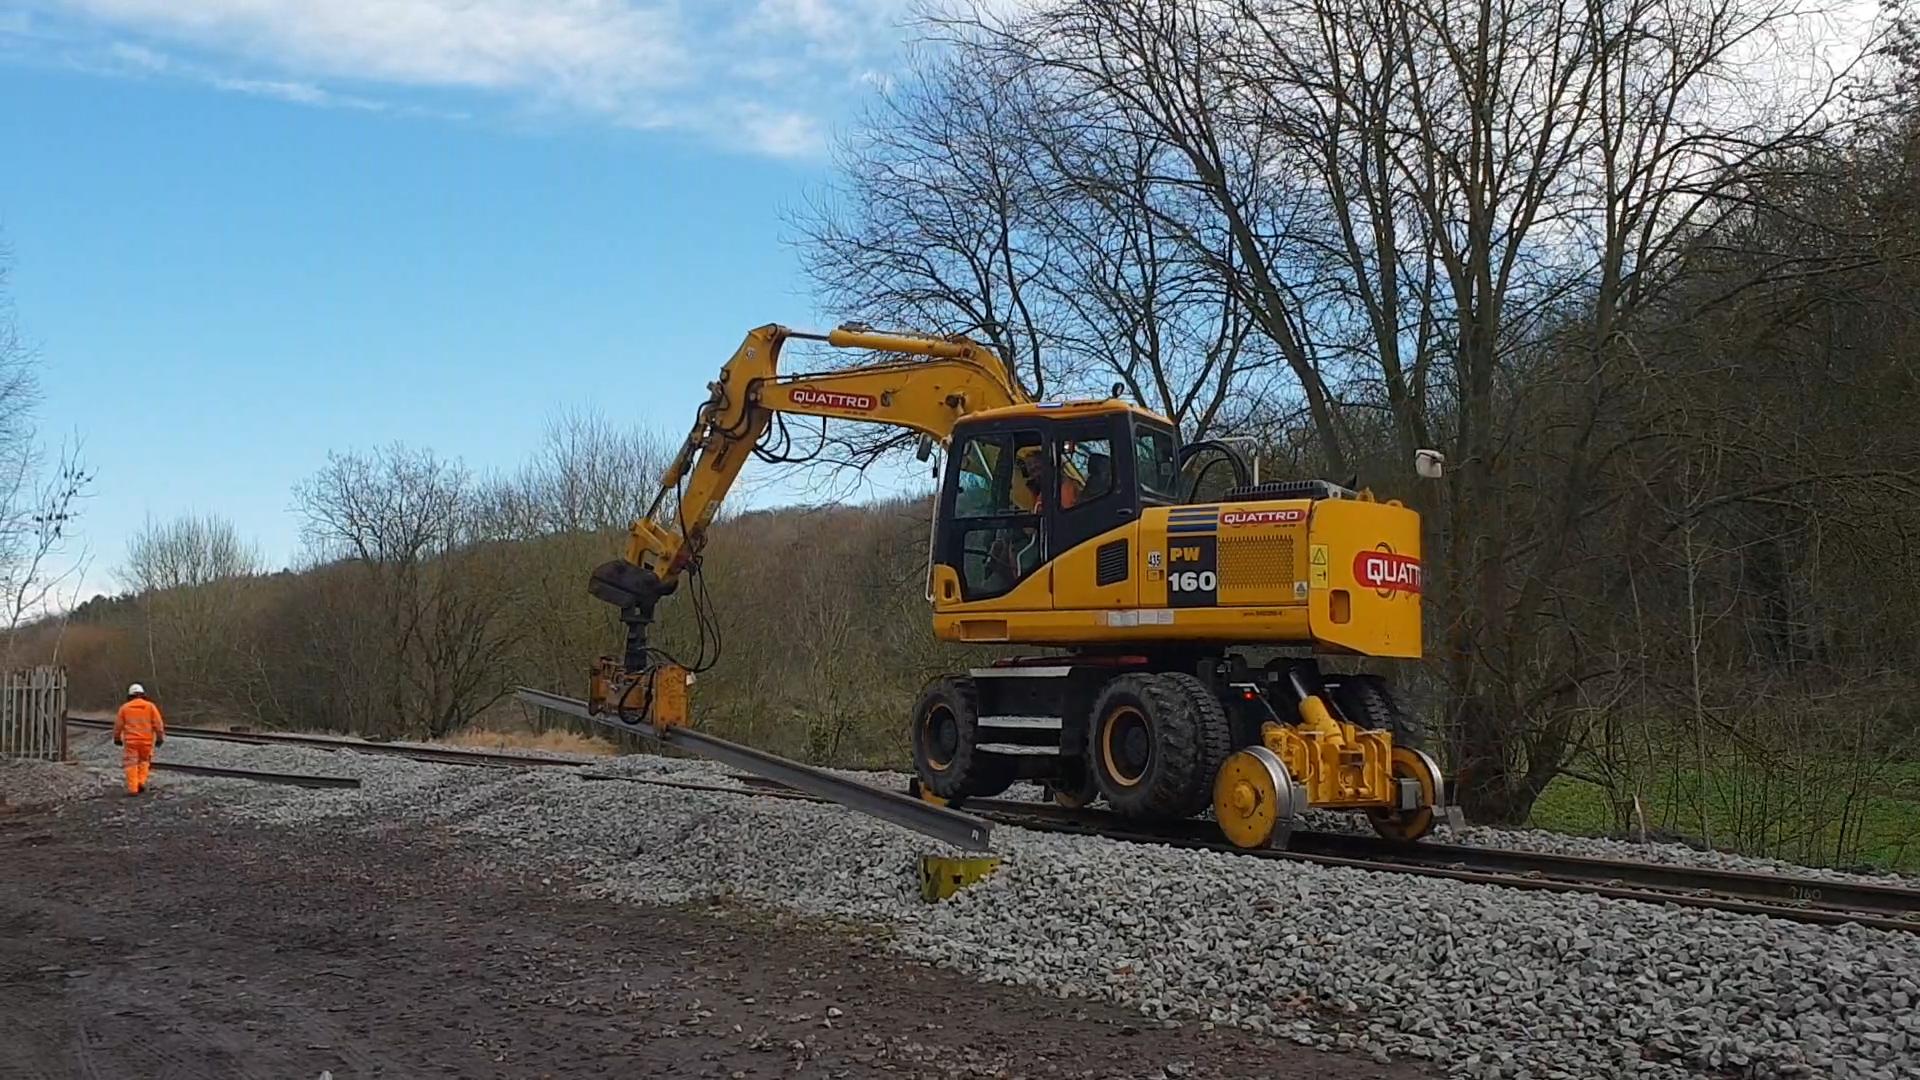 engineering work of rail tracks